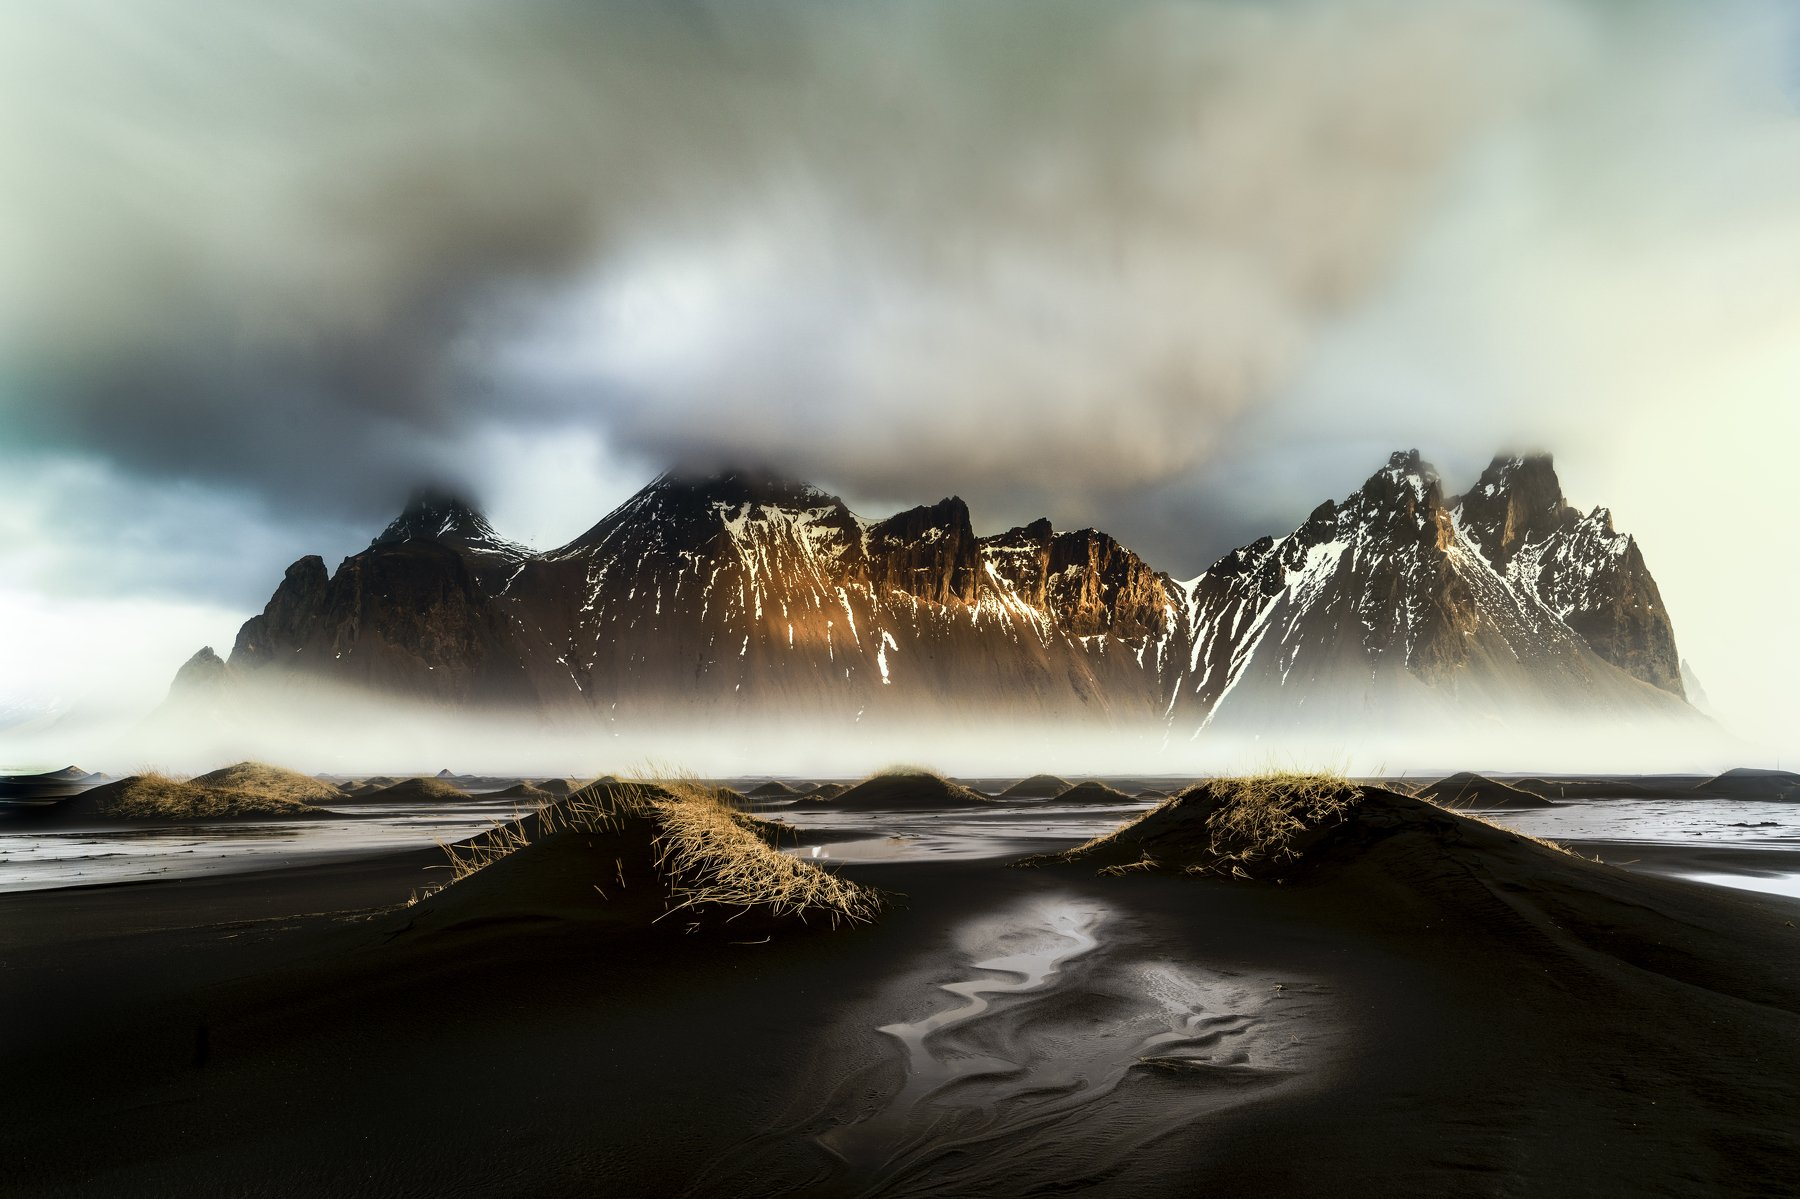 iceland,vestrahorn,mountain,mist,fog,travel,nikon d810,zeiss 21mm,black sand,, Felix Ostapenko